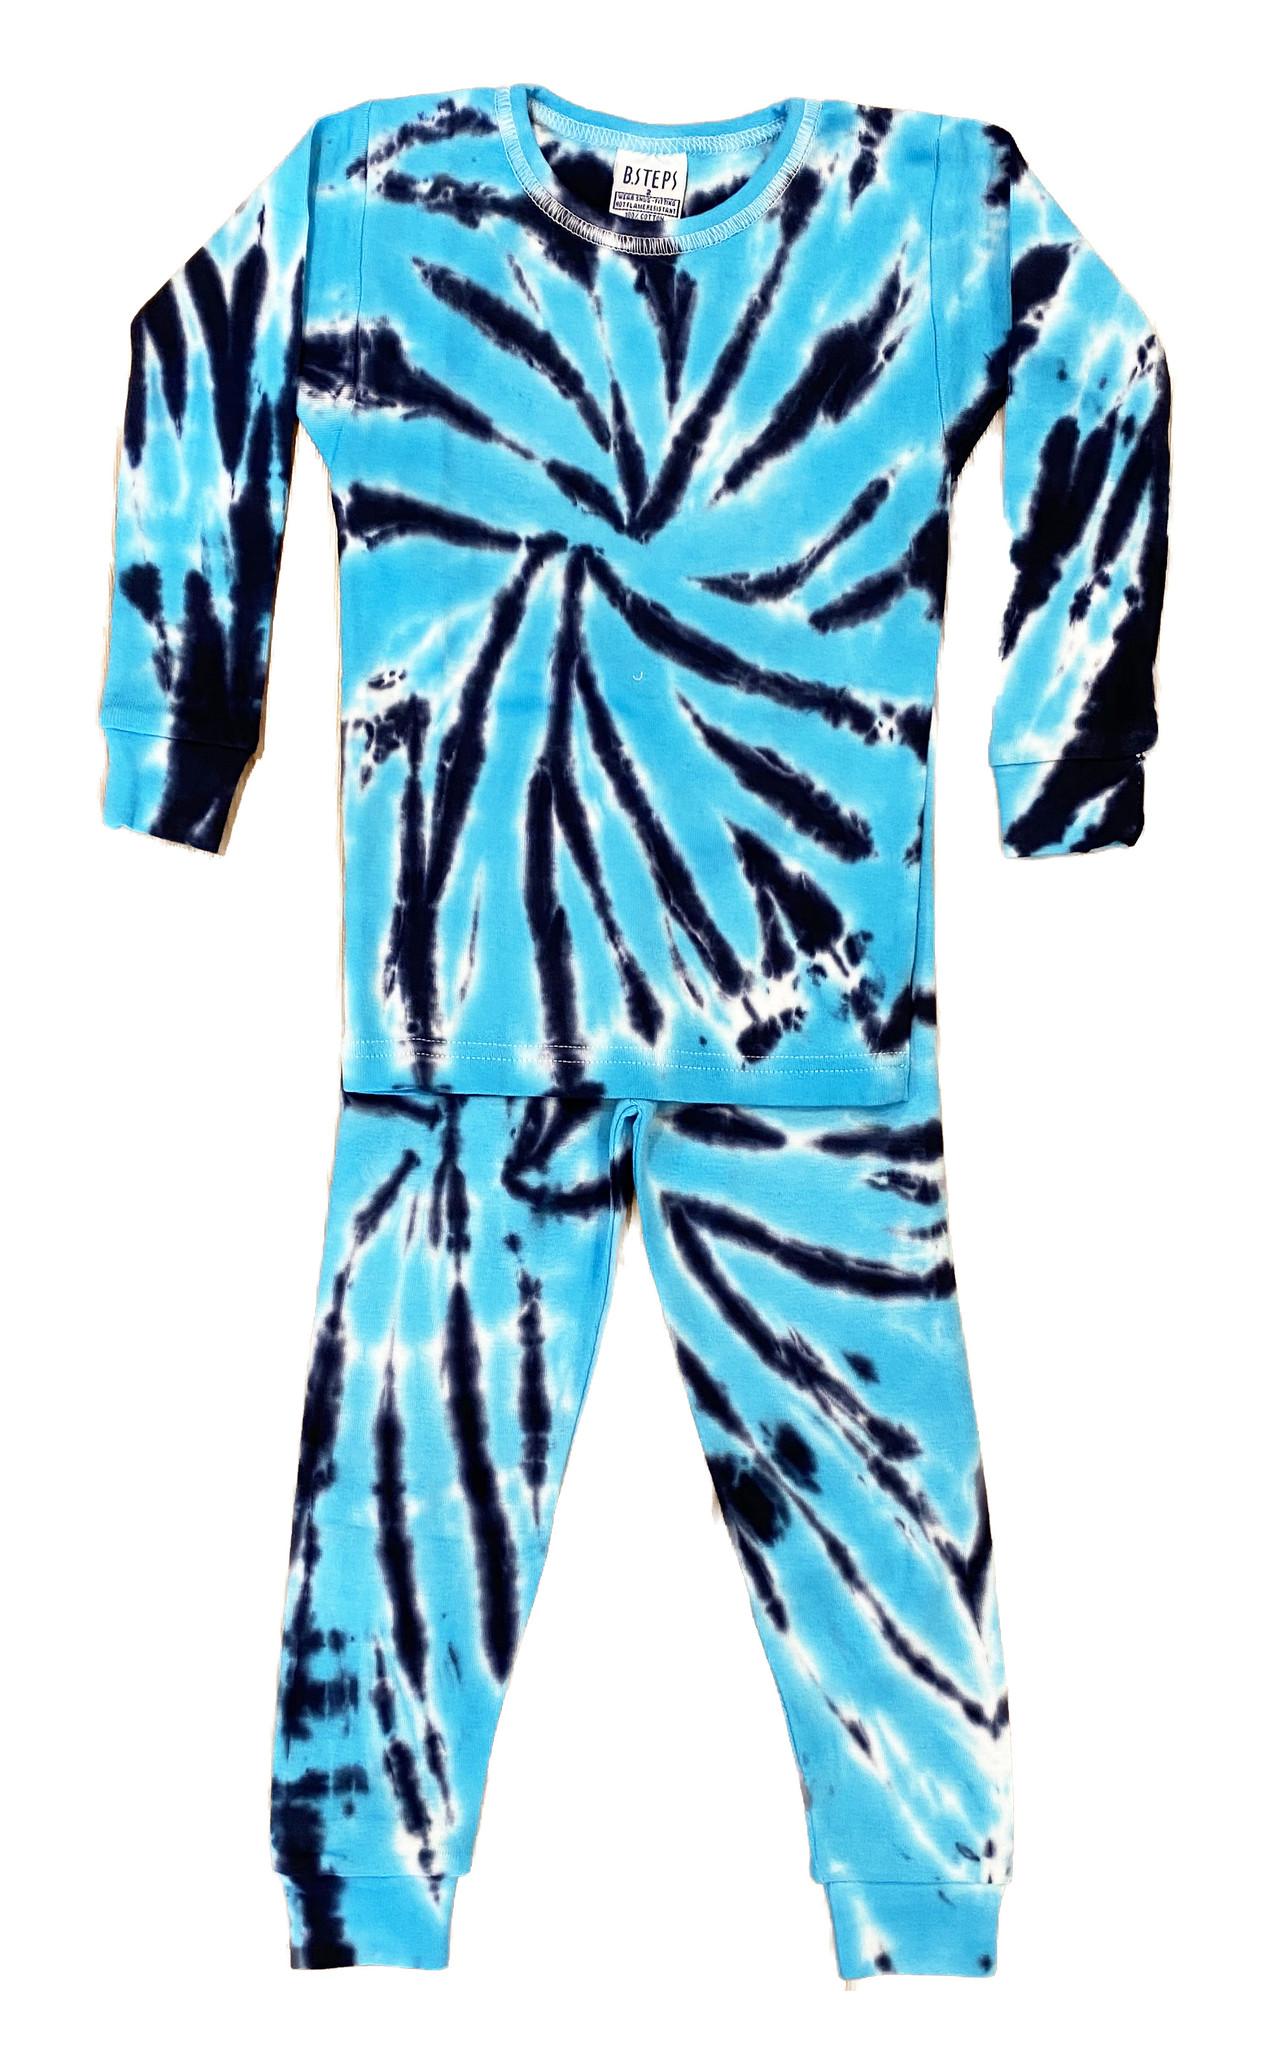 Baby Steps Turq/Navy Tie Dye Cotton PJ Set